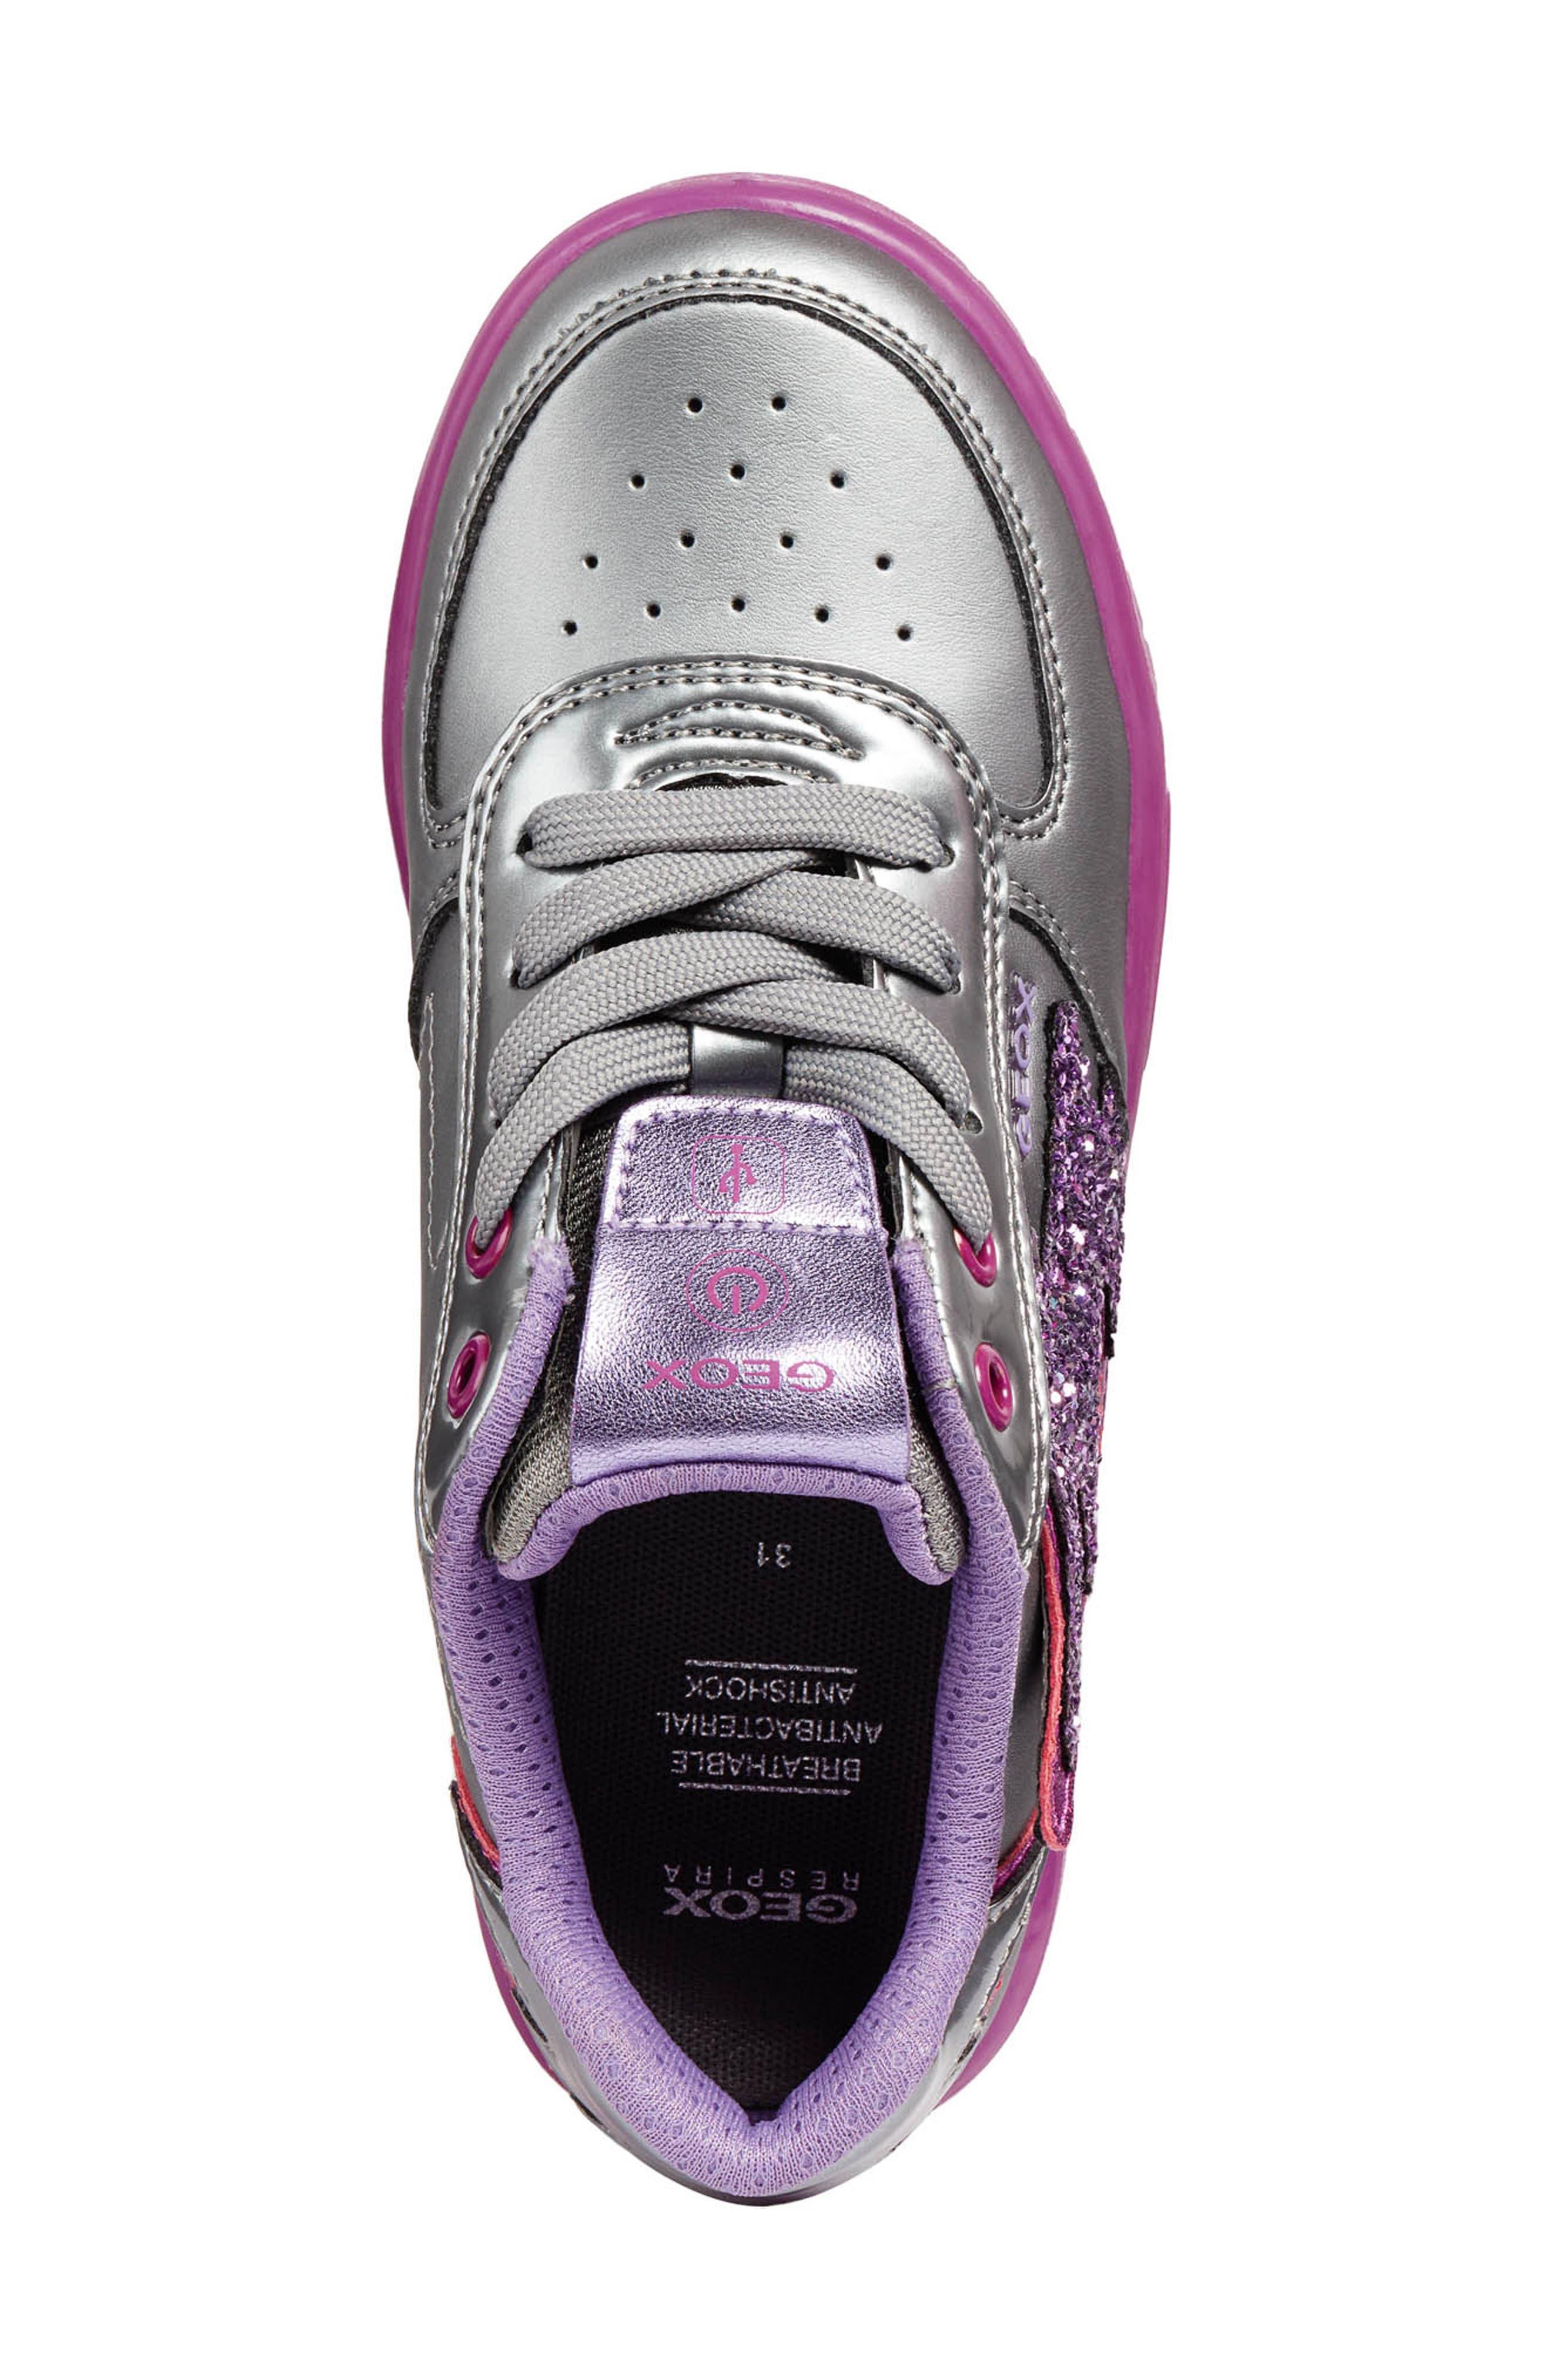 Kommodor Glitter Light Up Sneaker,                             Alternate thumbnail 4, color,                             DARK SILVER/LILAC